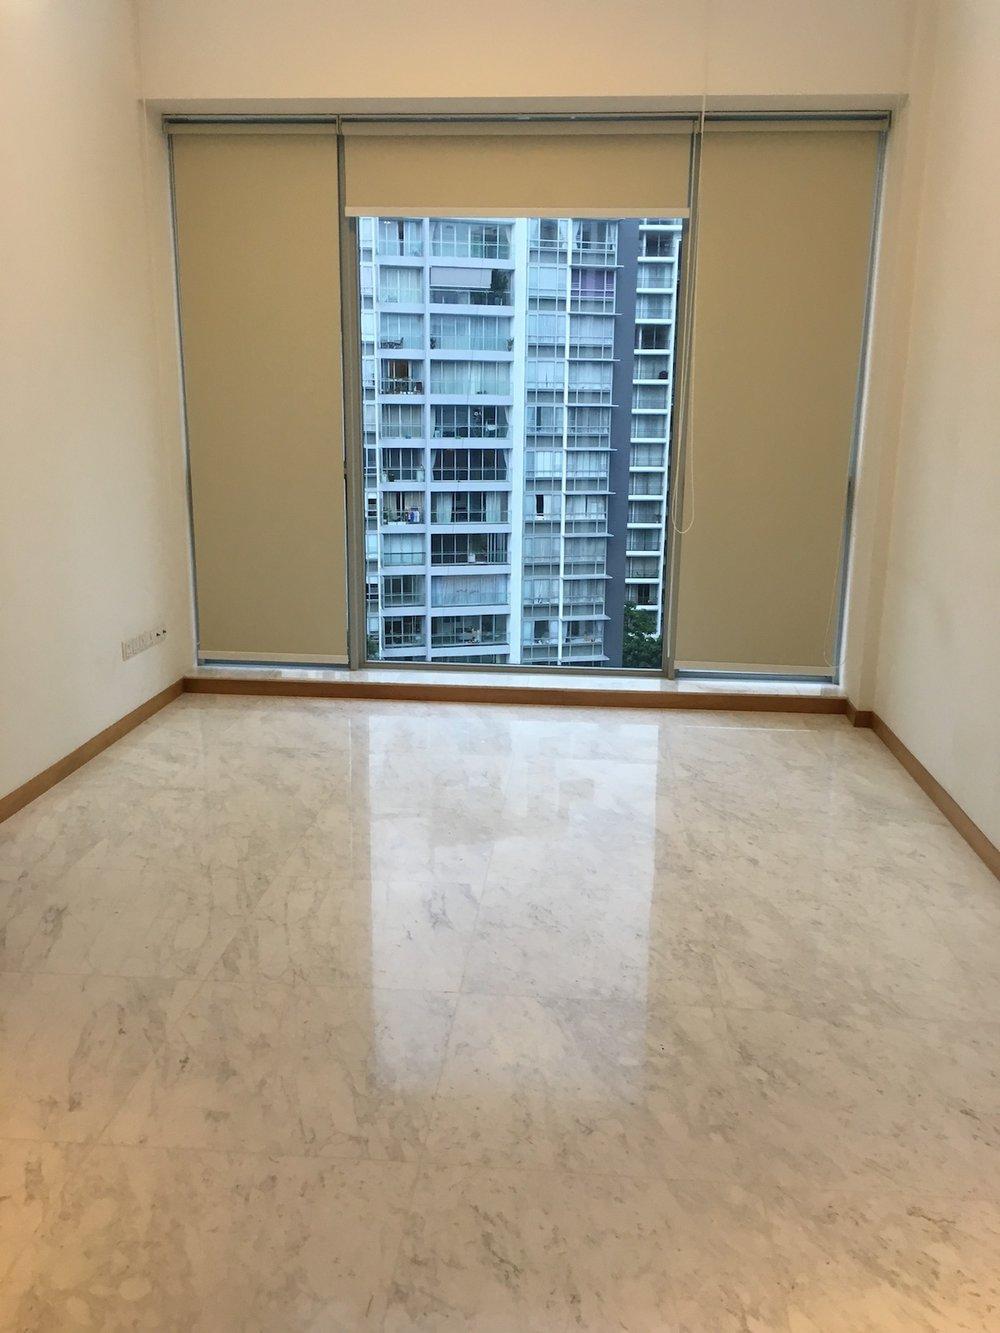 VIDA - 2 Bedroom loft near Newton CircusS$6,700